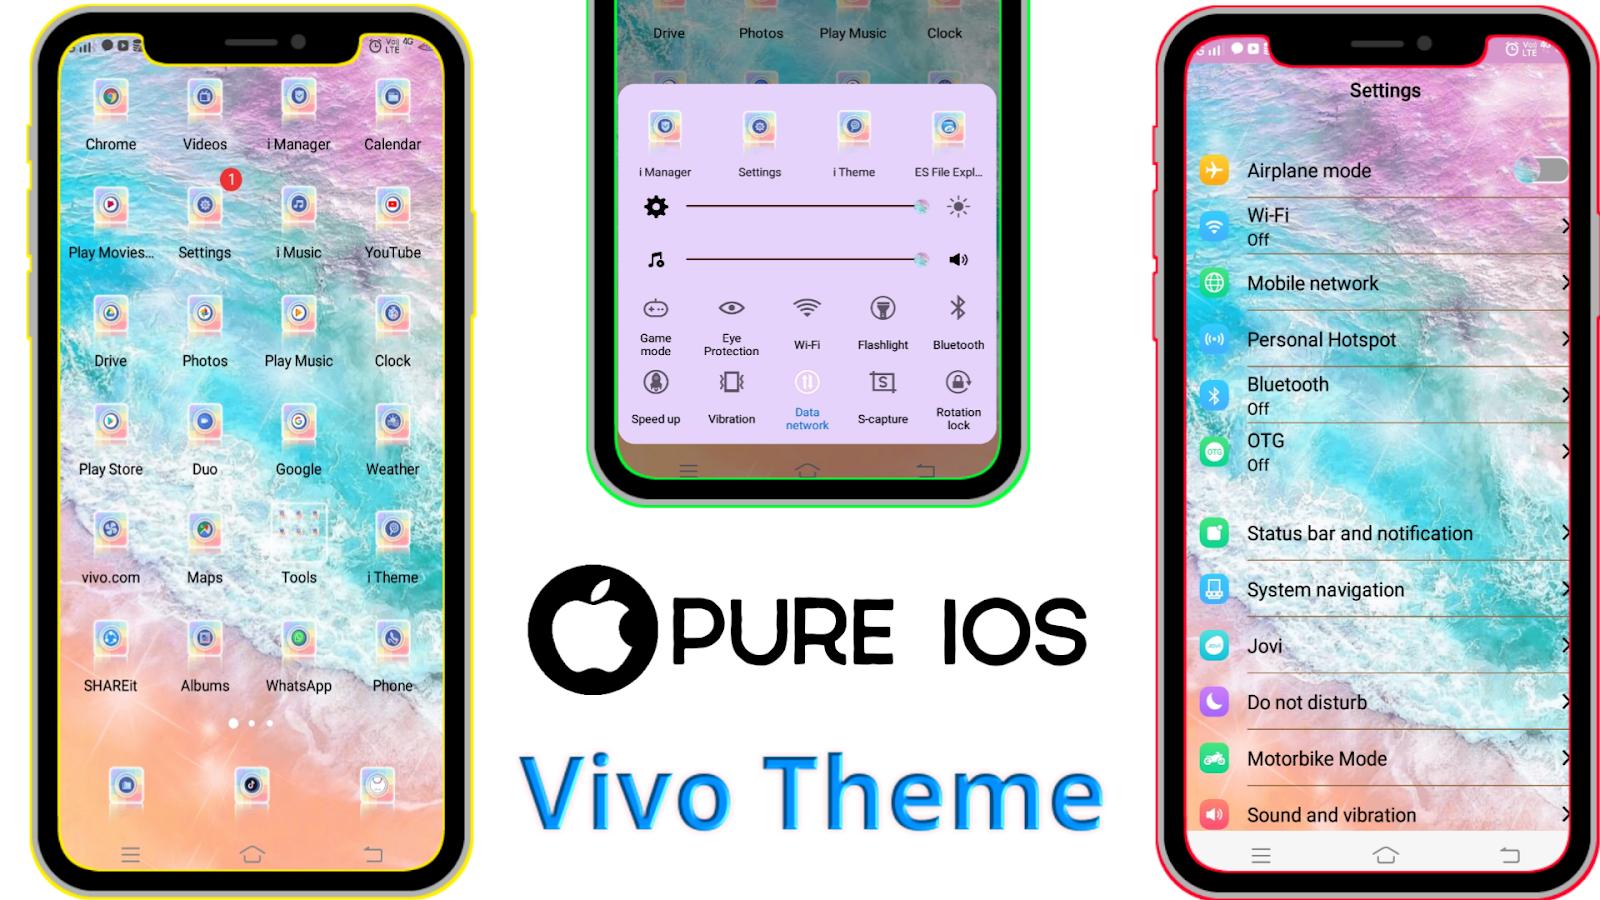 Vivo Theme : Pure IOS 12 Theme for All Vivo Smartphones || New Theme